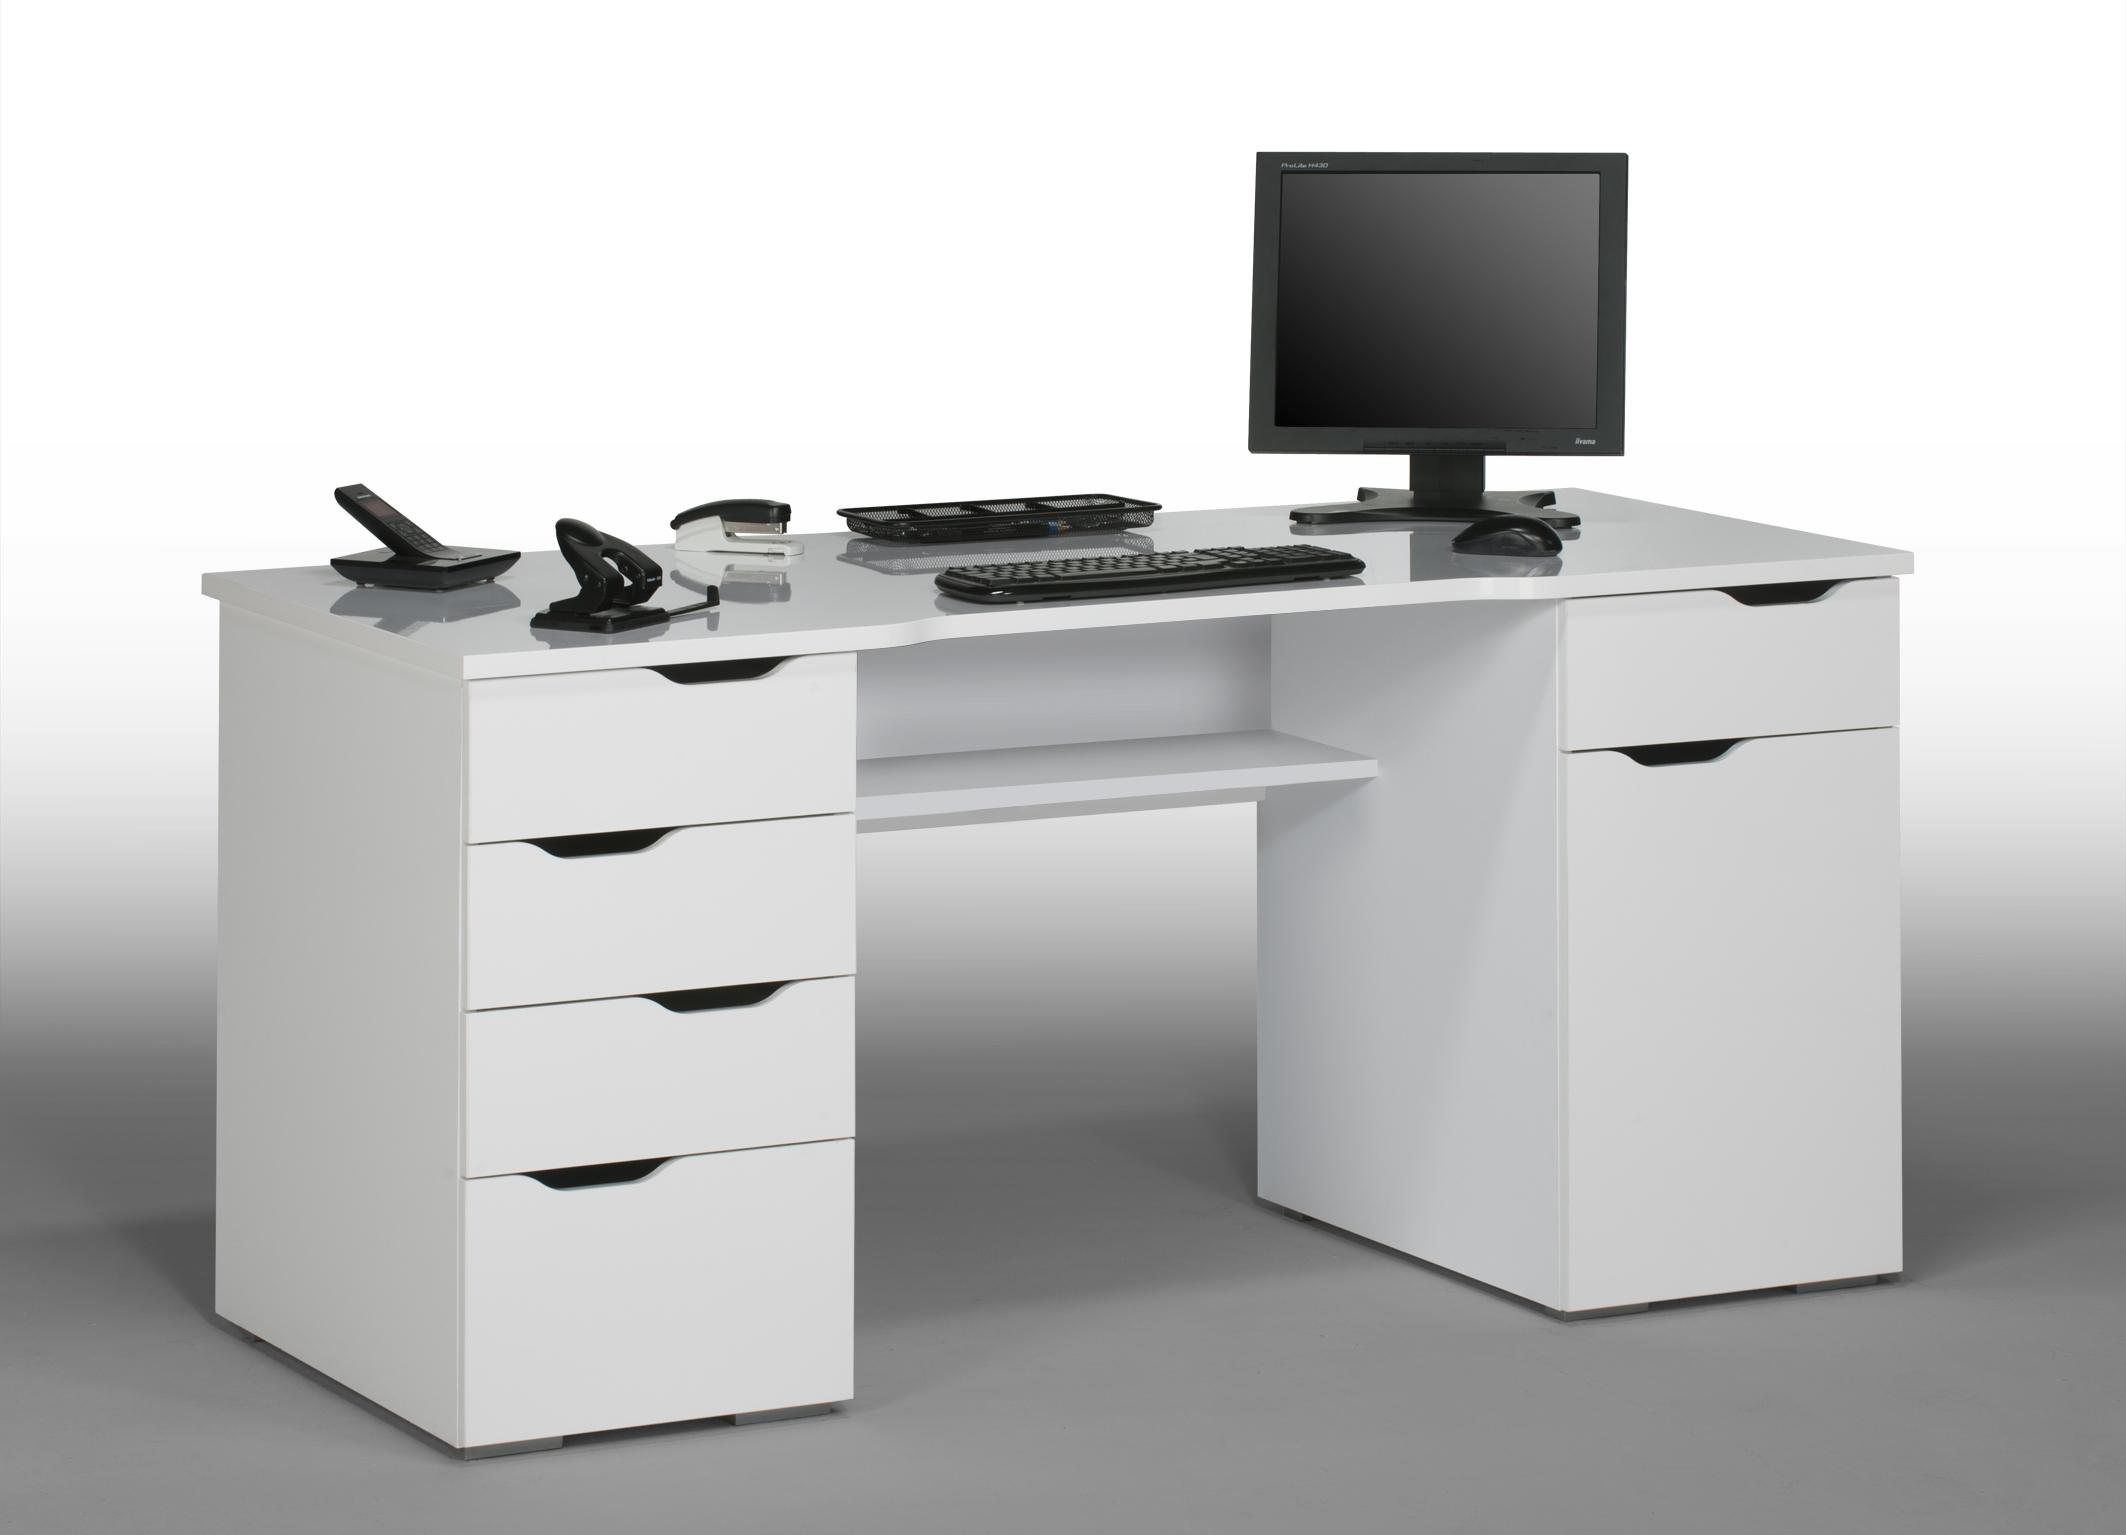 Bureau informatique design laqu blanc claudelle Bureau d ado